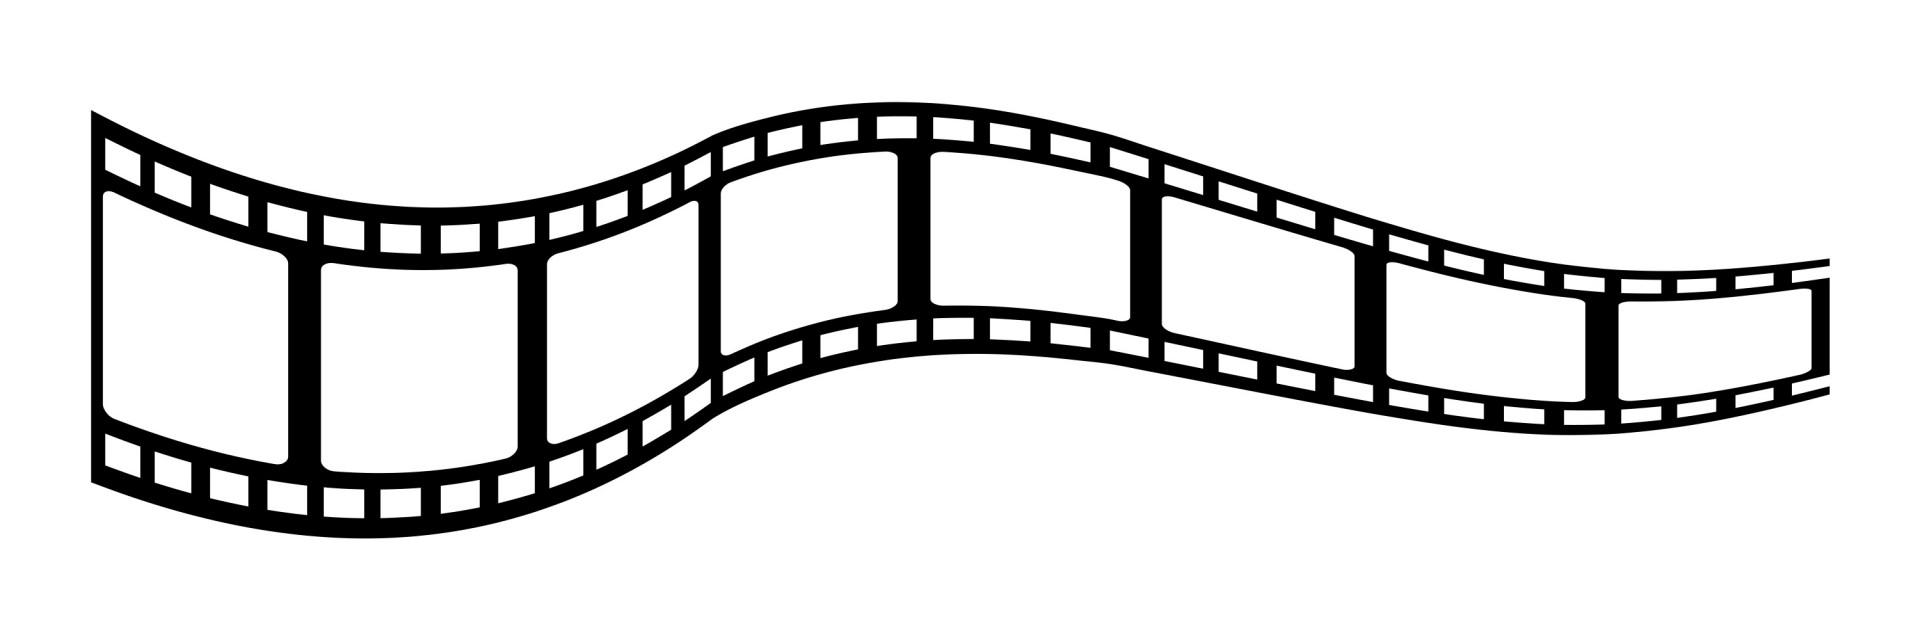 1920x640 Film Strip Clip Art